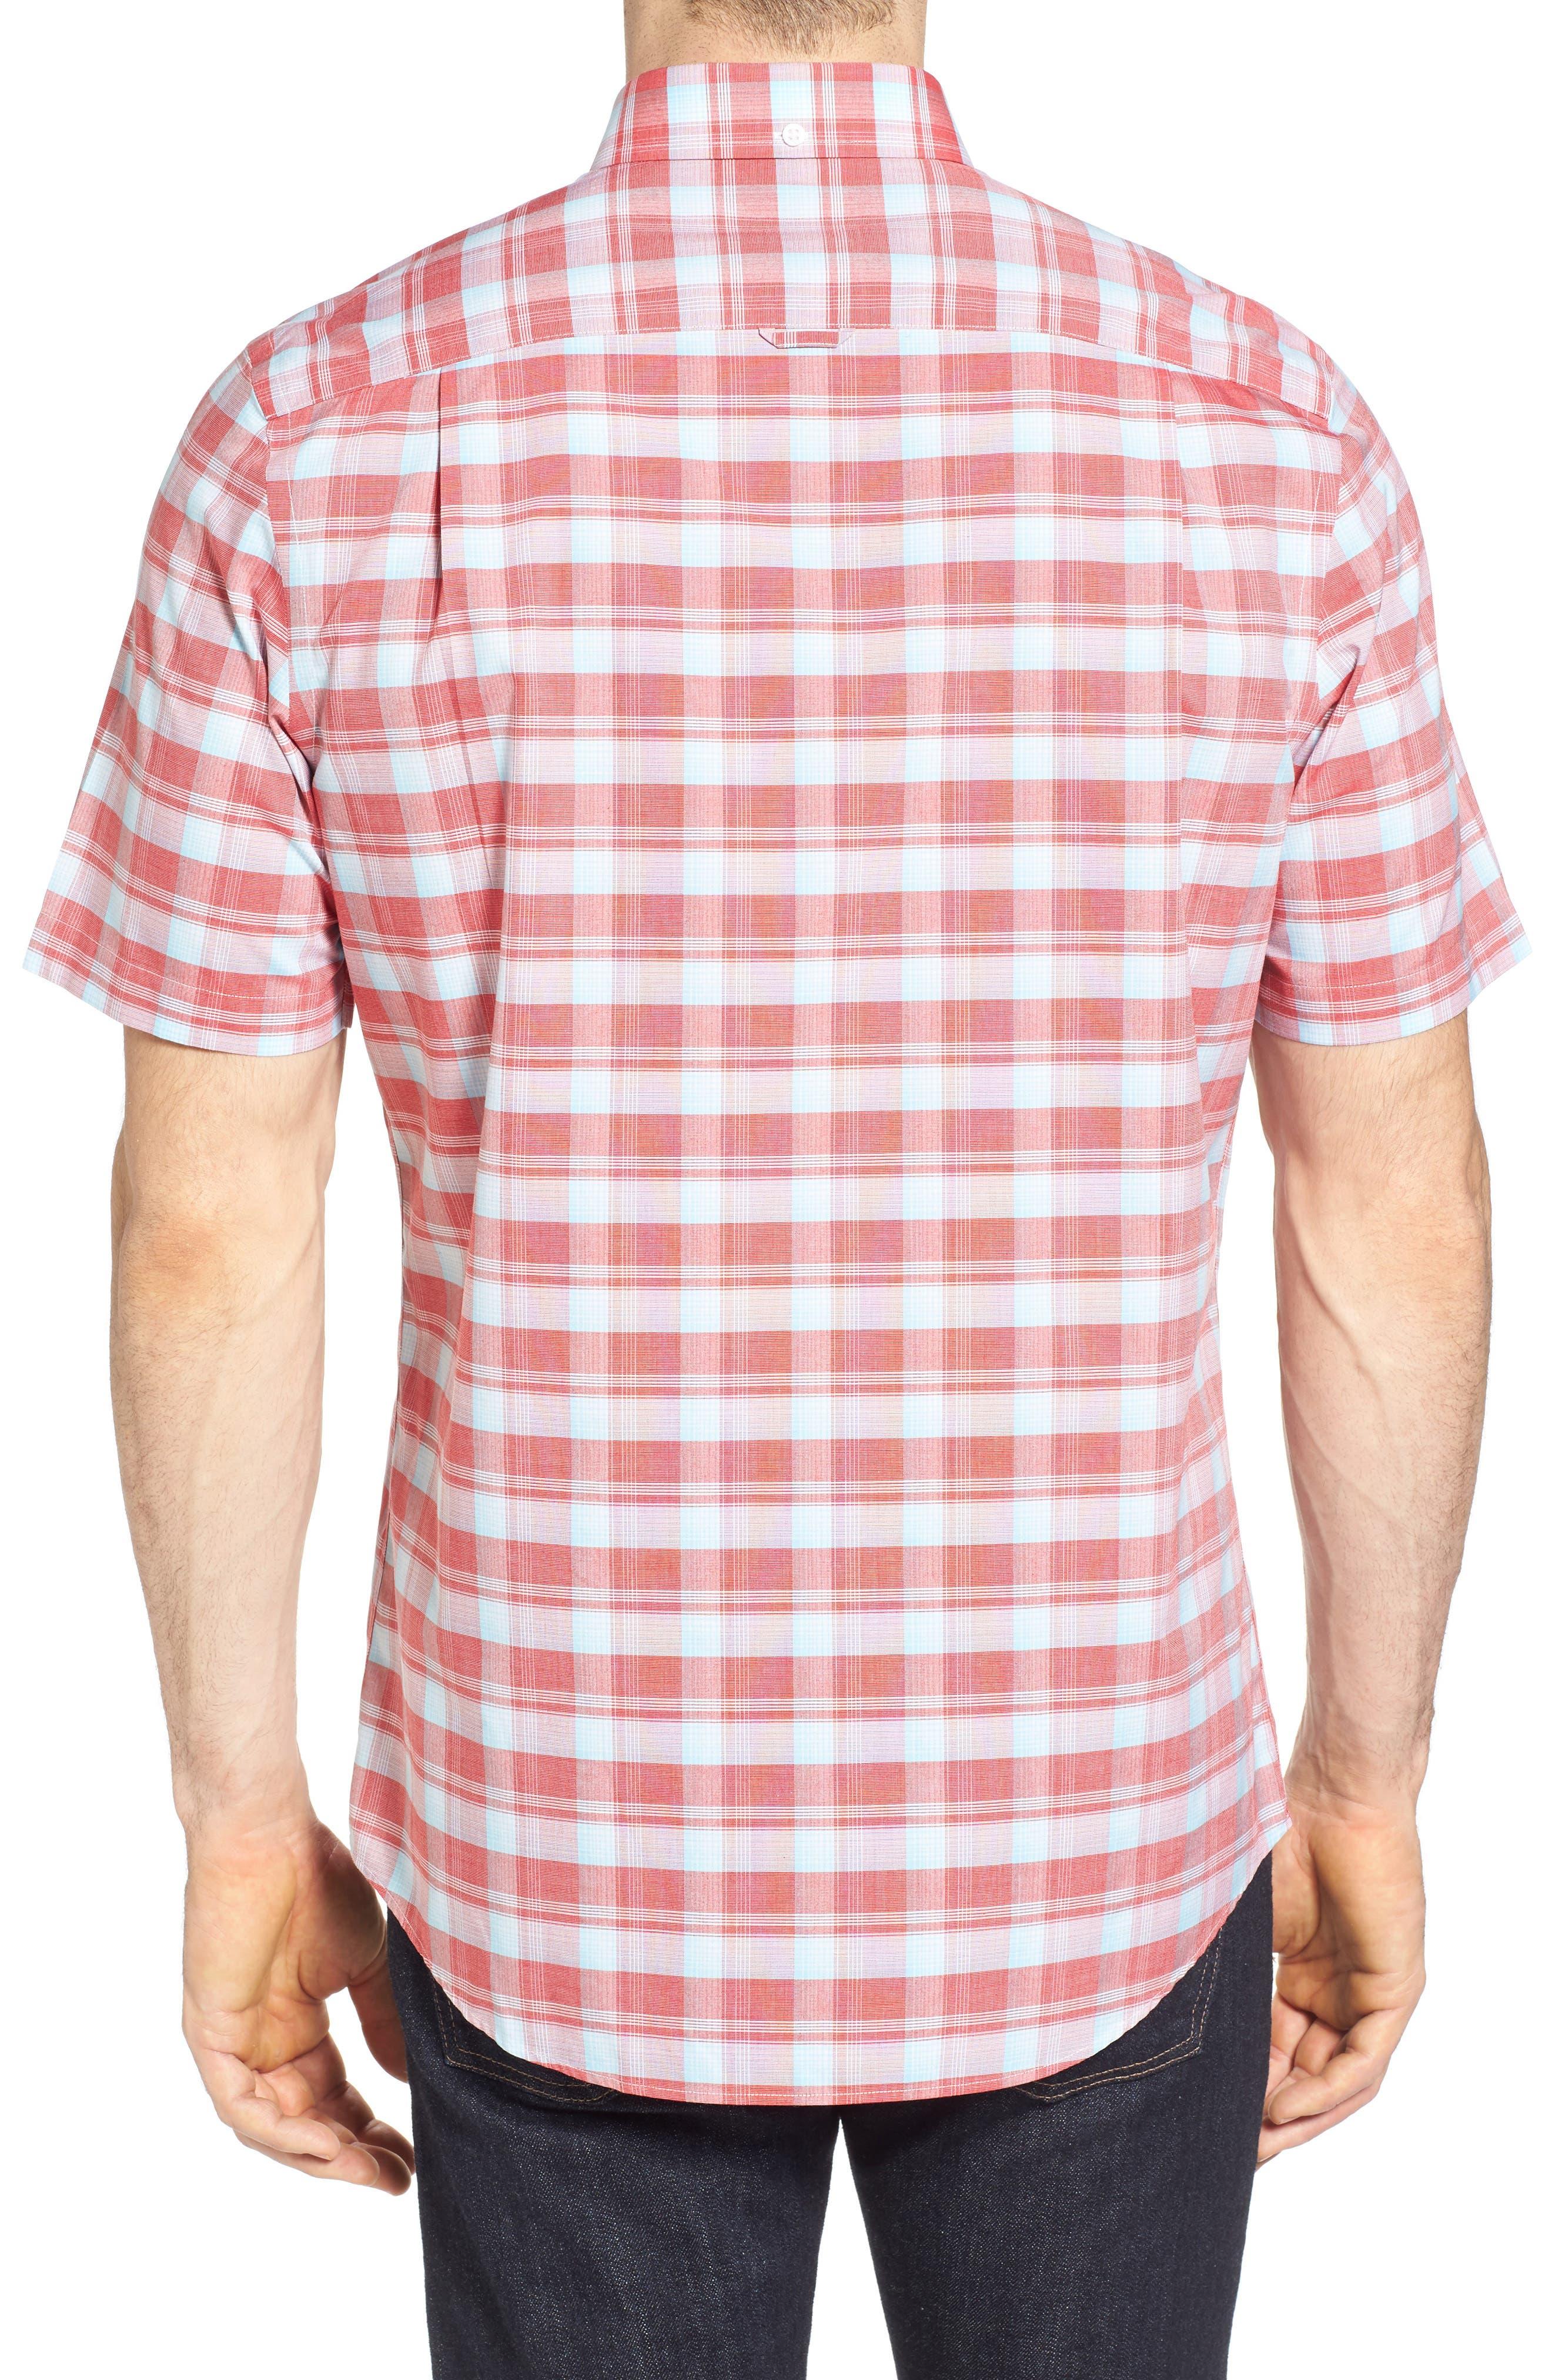 Regular Fit Plaid Sport Shirt,                             Alternate thumbnail 3, color,                             Red Pompeii Blue Check